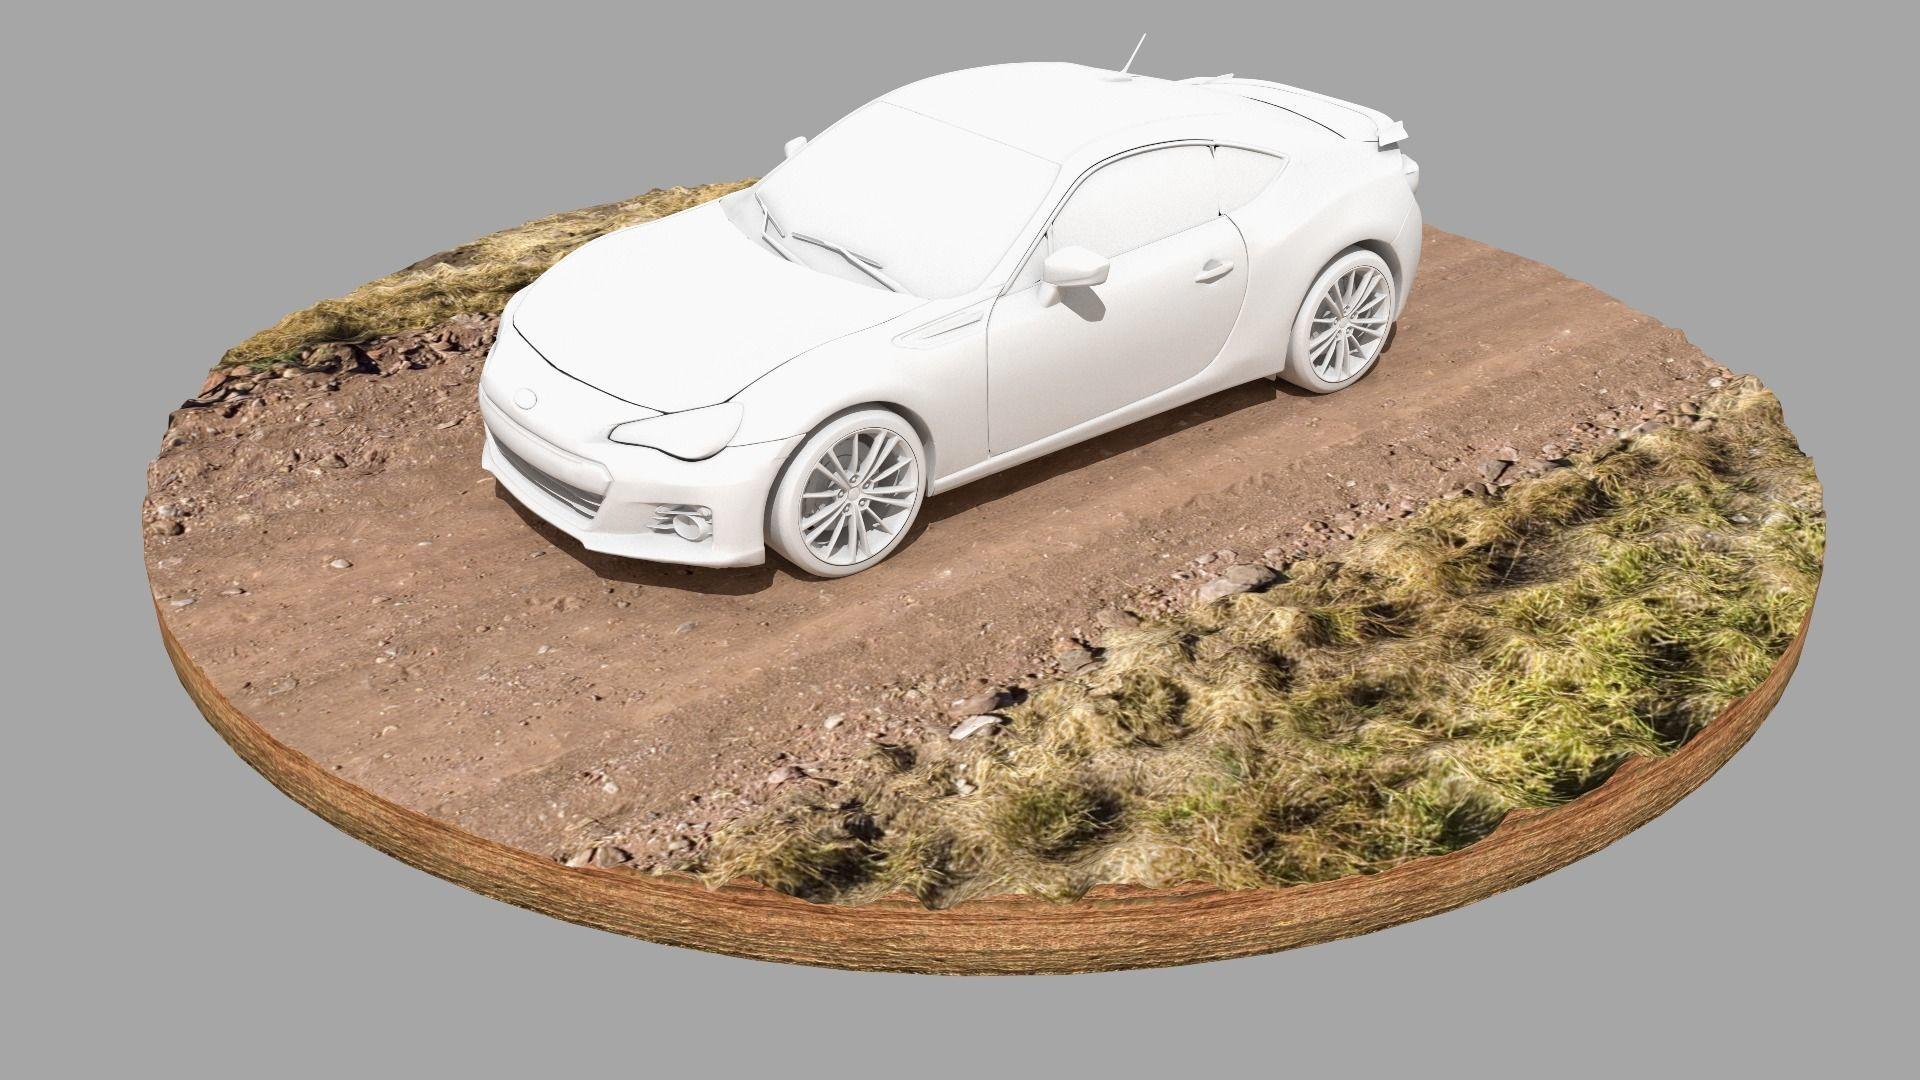 Dirt Road Vehicle Plinth